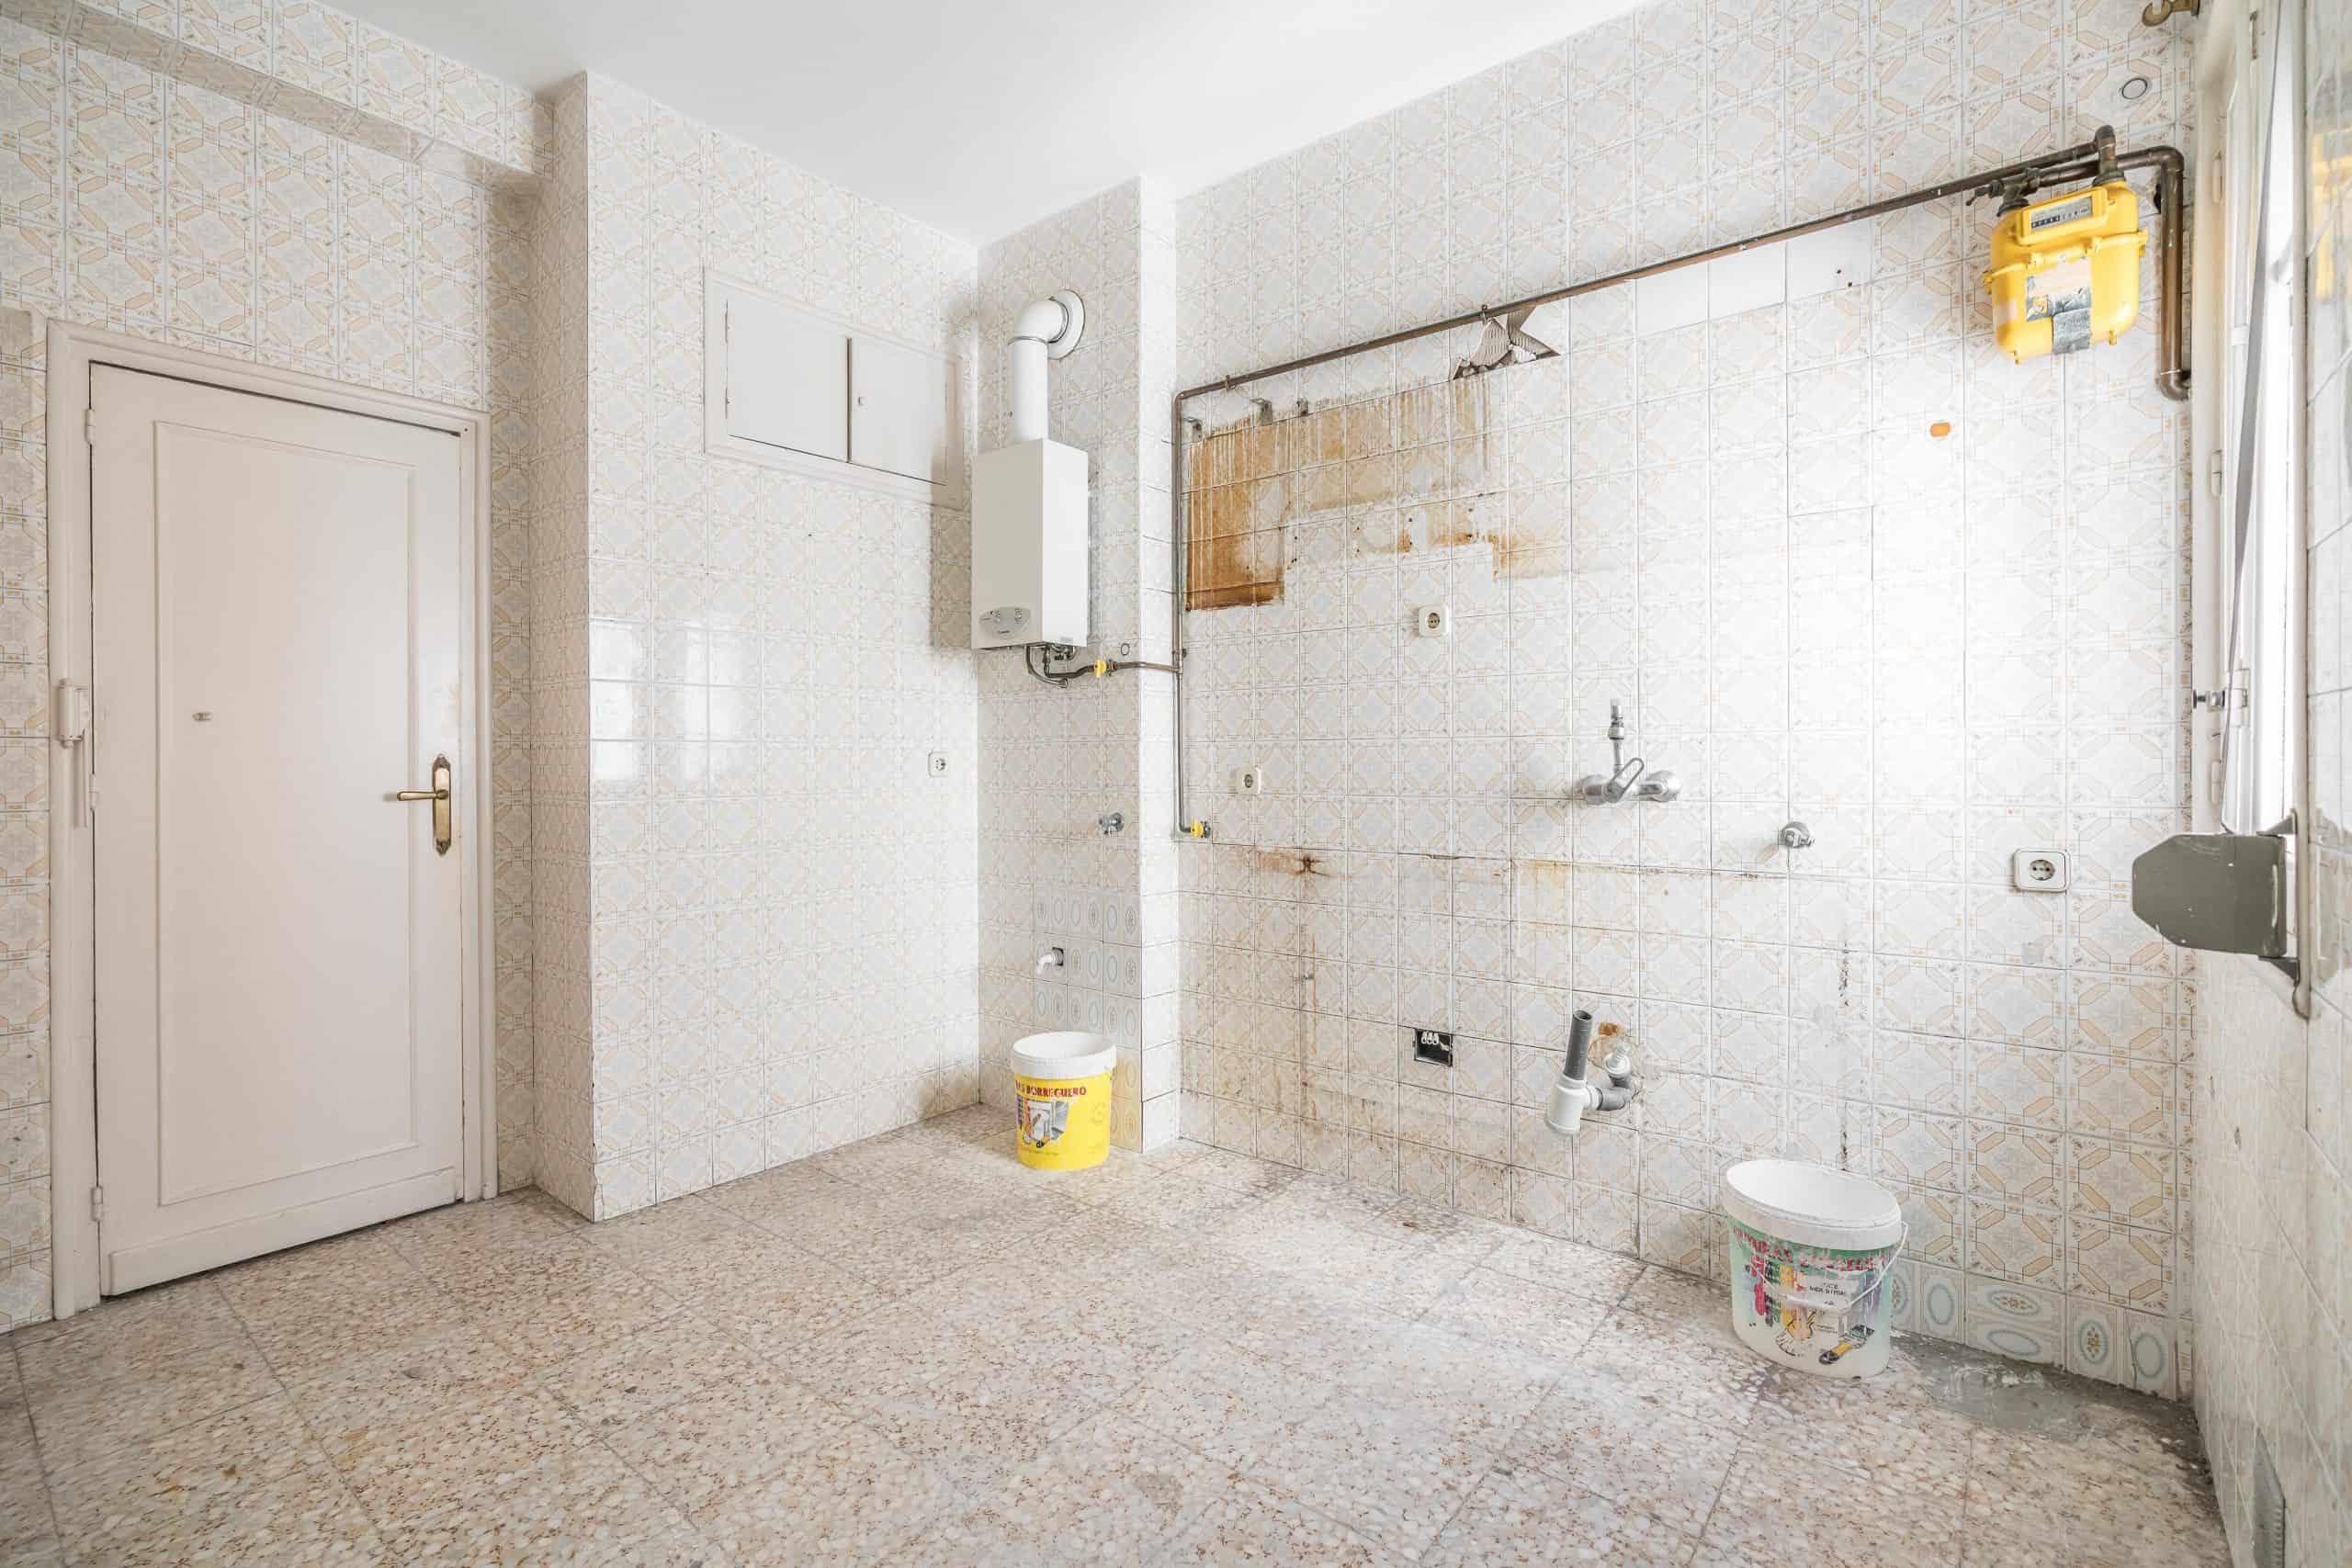 Agencia Inmobiliaria de Madrid-FUTUROCASA-Zona ARGANZUELA-EMBAJADORES-LEGAZPI -calle ALEJANDRO FERRANT -cocina1